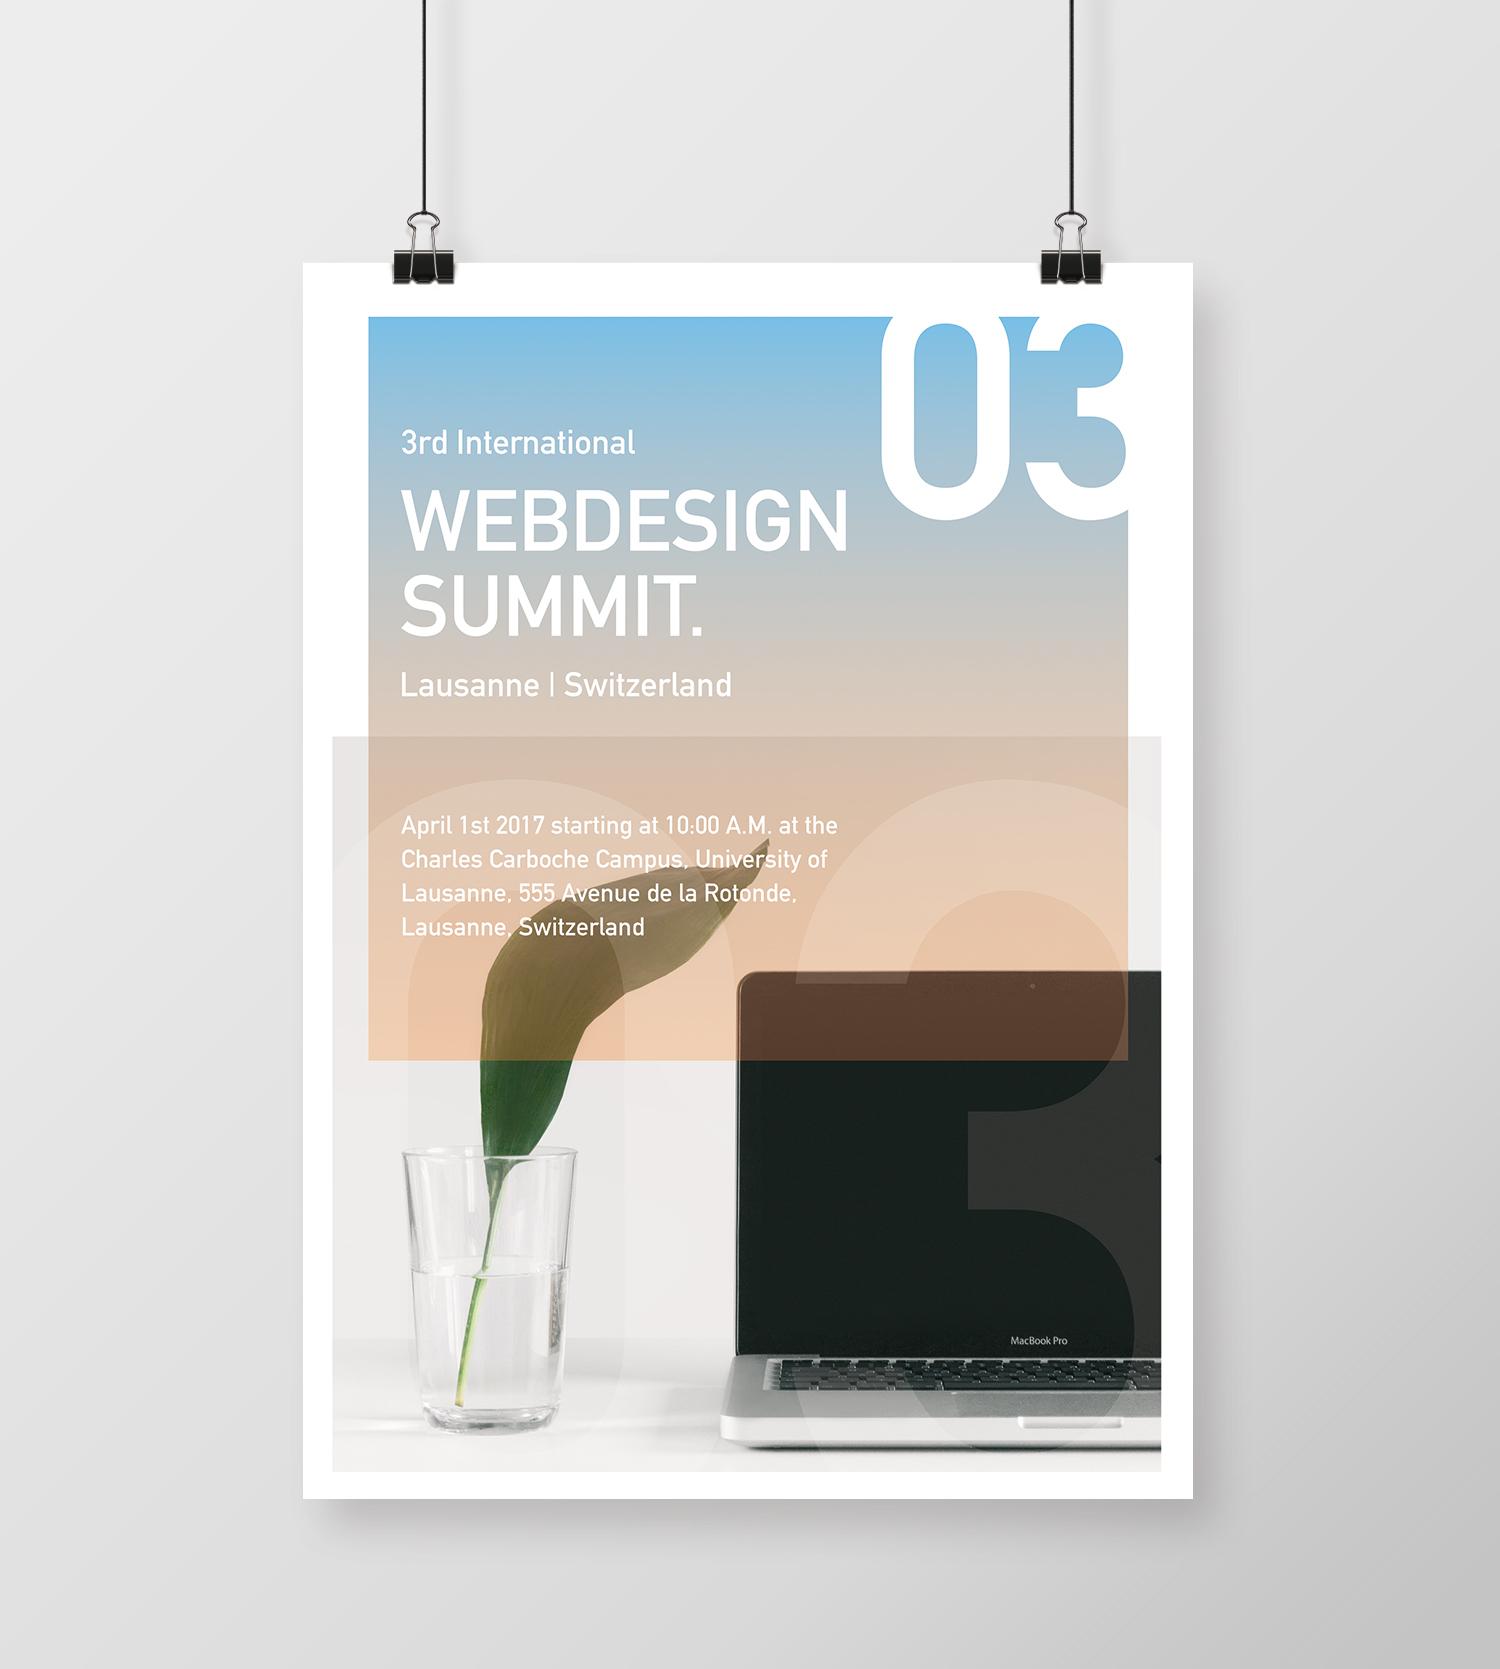 Best Way To Design Poster On Mac: Michael Oeser - Webdesigner and WordPress Expert - Event Poster rh:michaeloeser.myportfolio.com,Design